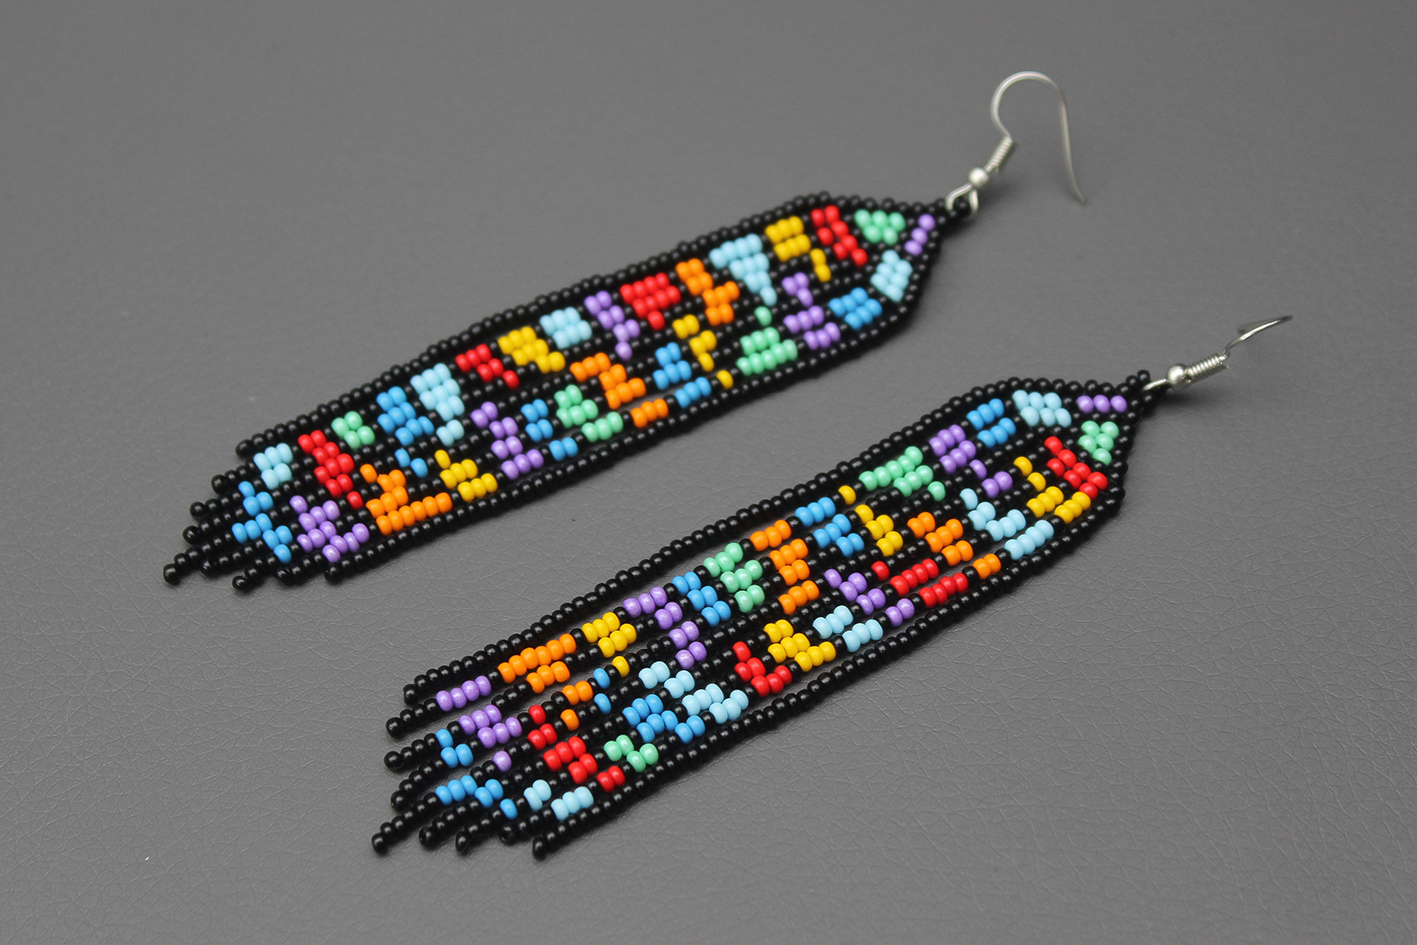 Beaded earrings Native american earrings Long earrings Seed bead earrings Silver earrings Fringle earrings Handmade earrings